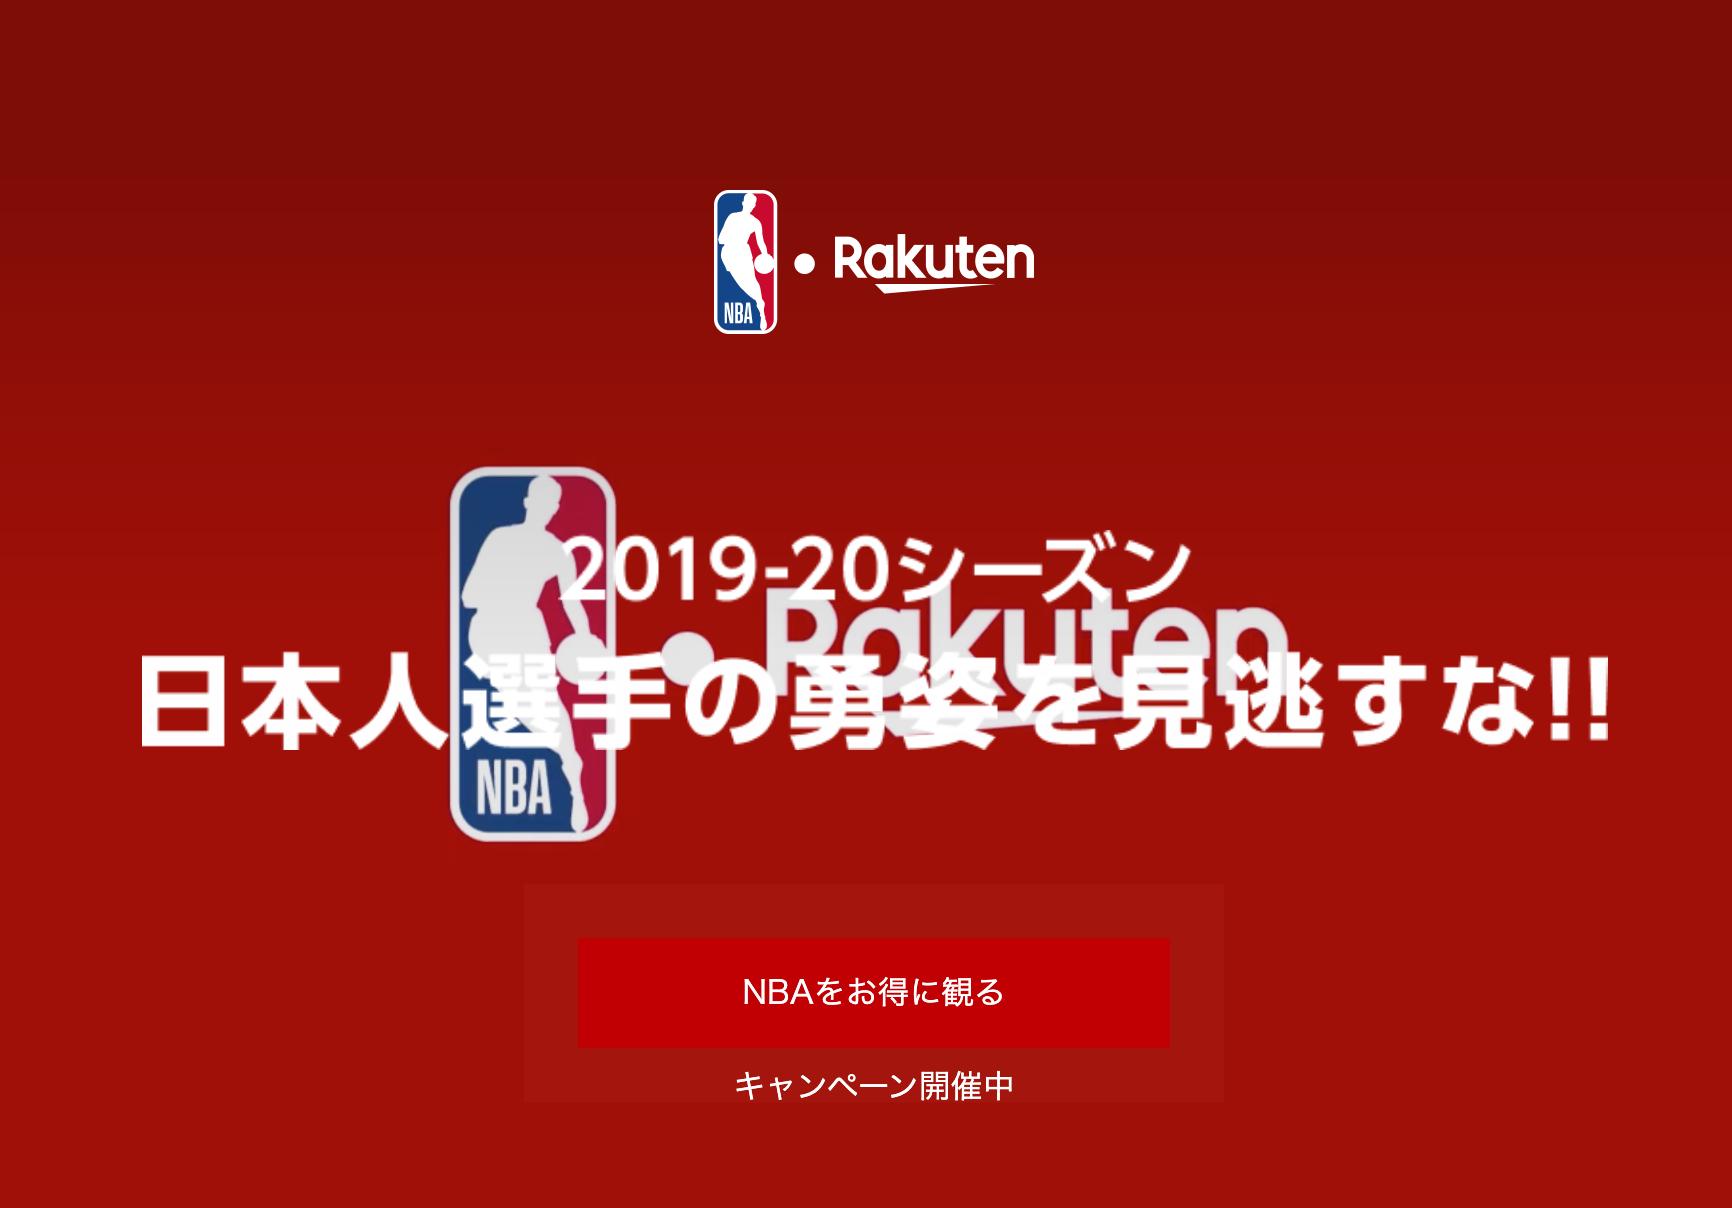 NBAクリスマスゲーム2019 放送予定